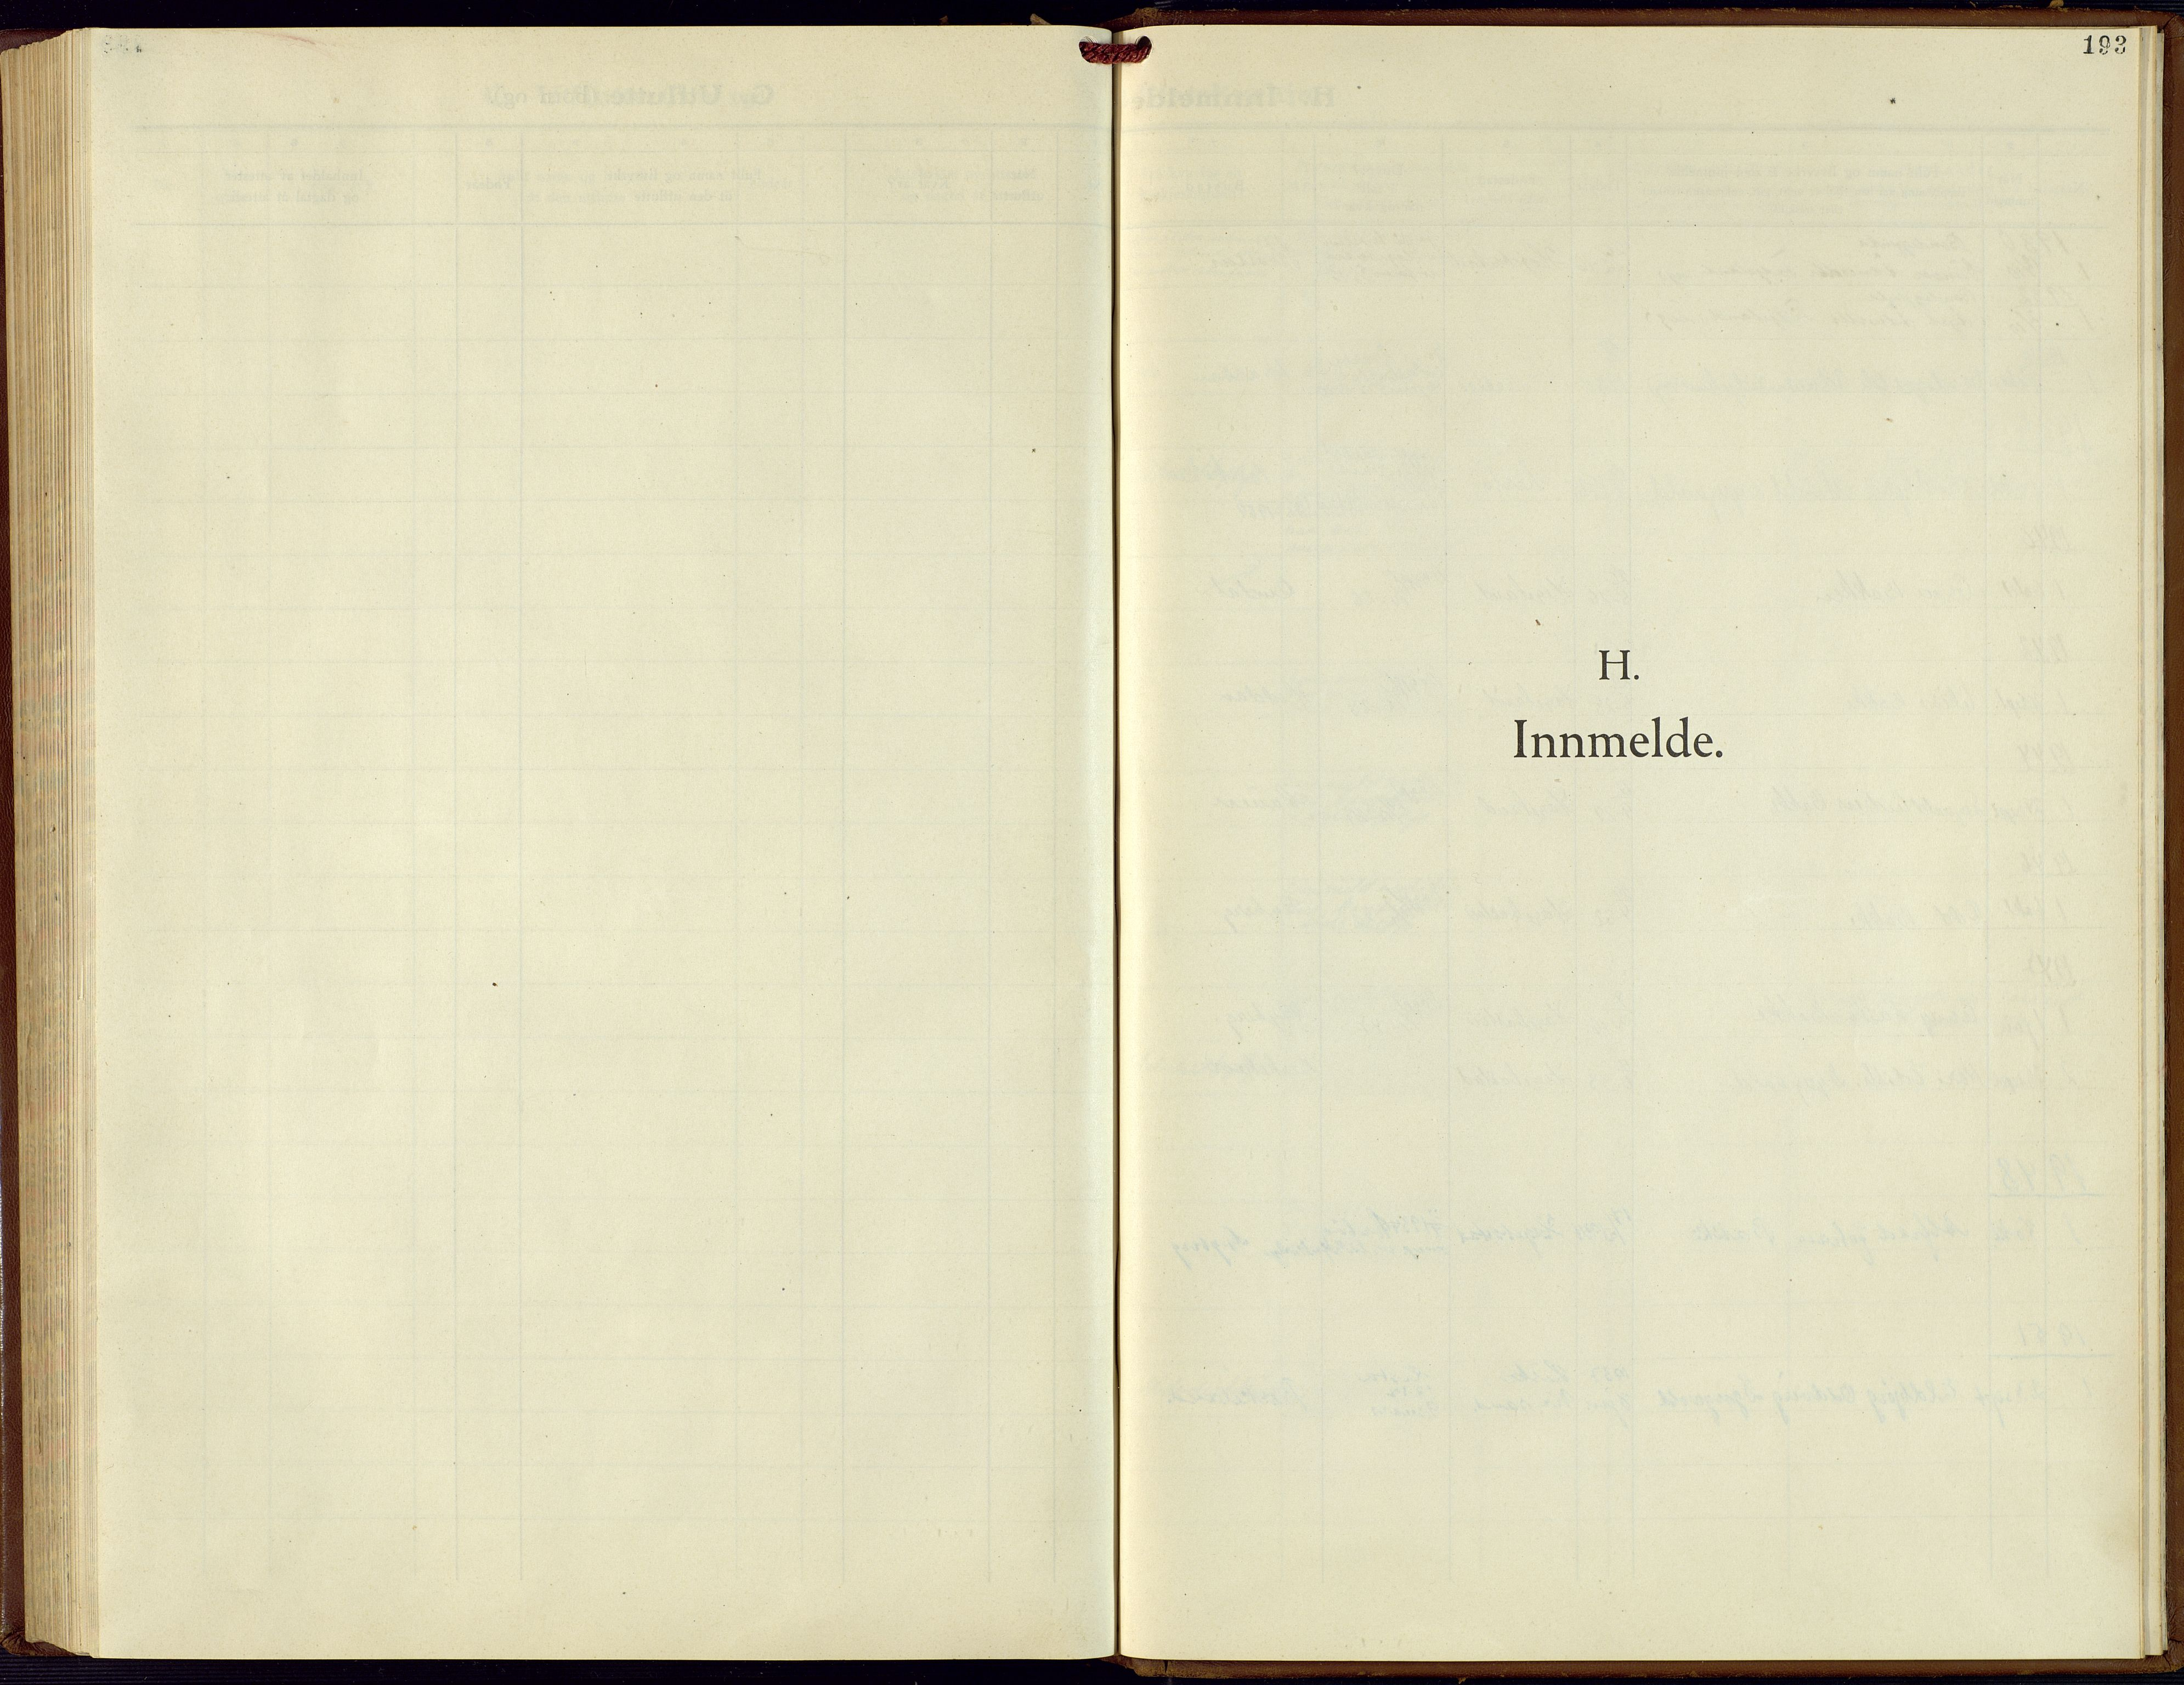 SAK, Hægebostad sokneprestkontor, F/Fb/Fba/L0006: Klokkerbok nr. B 6, 1931-1970, s. 193